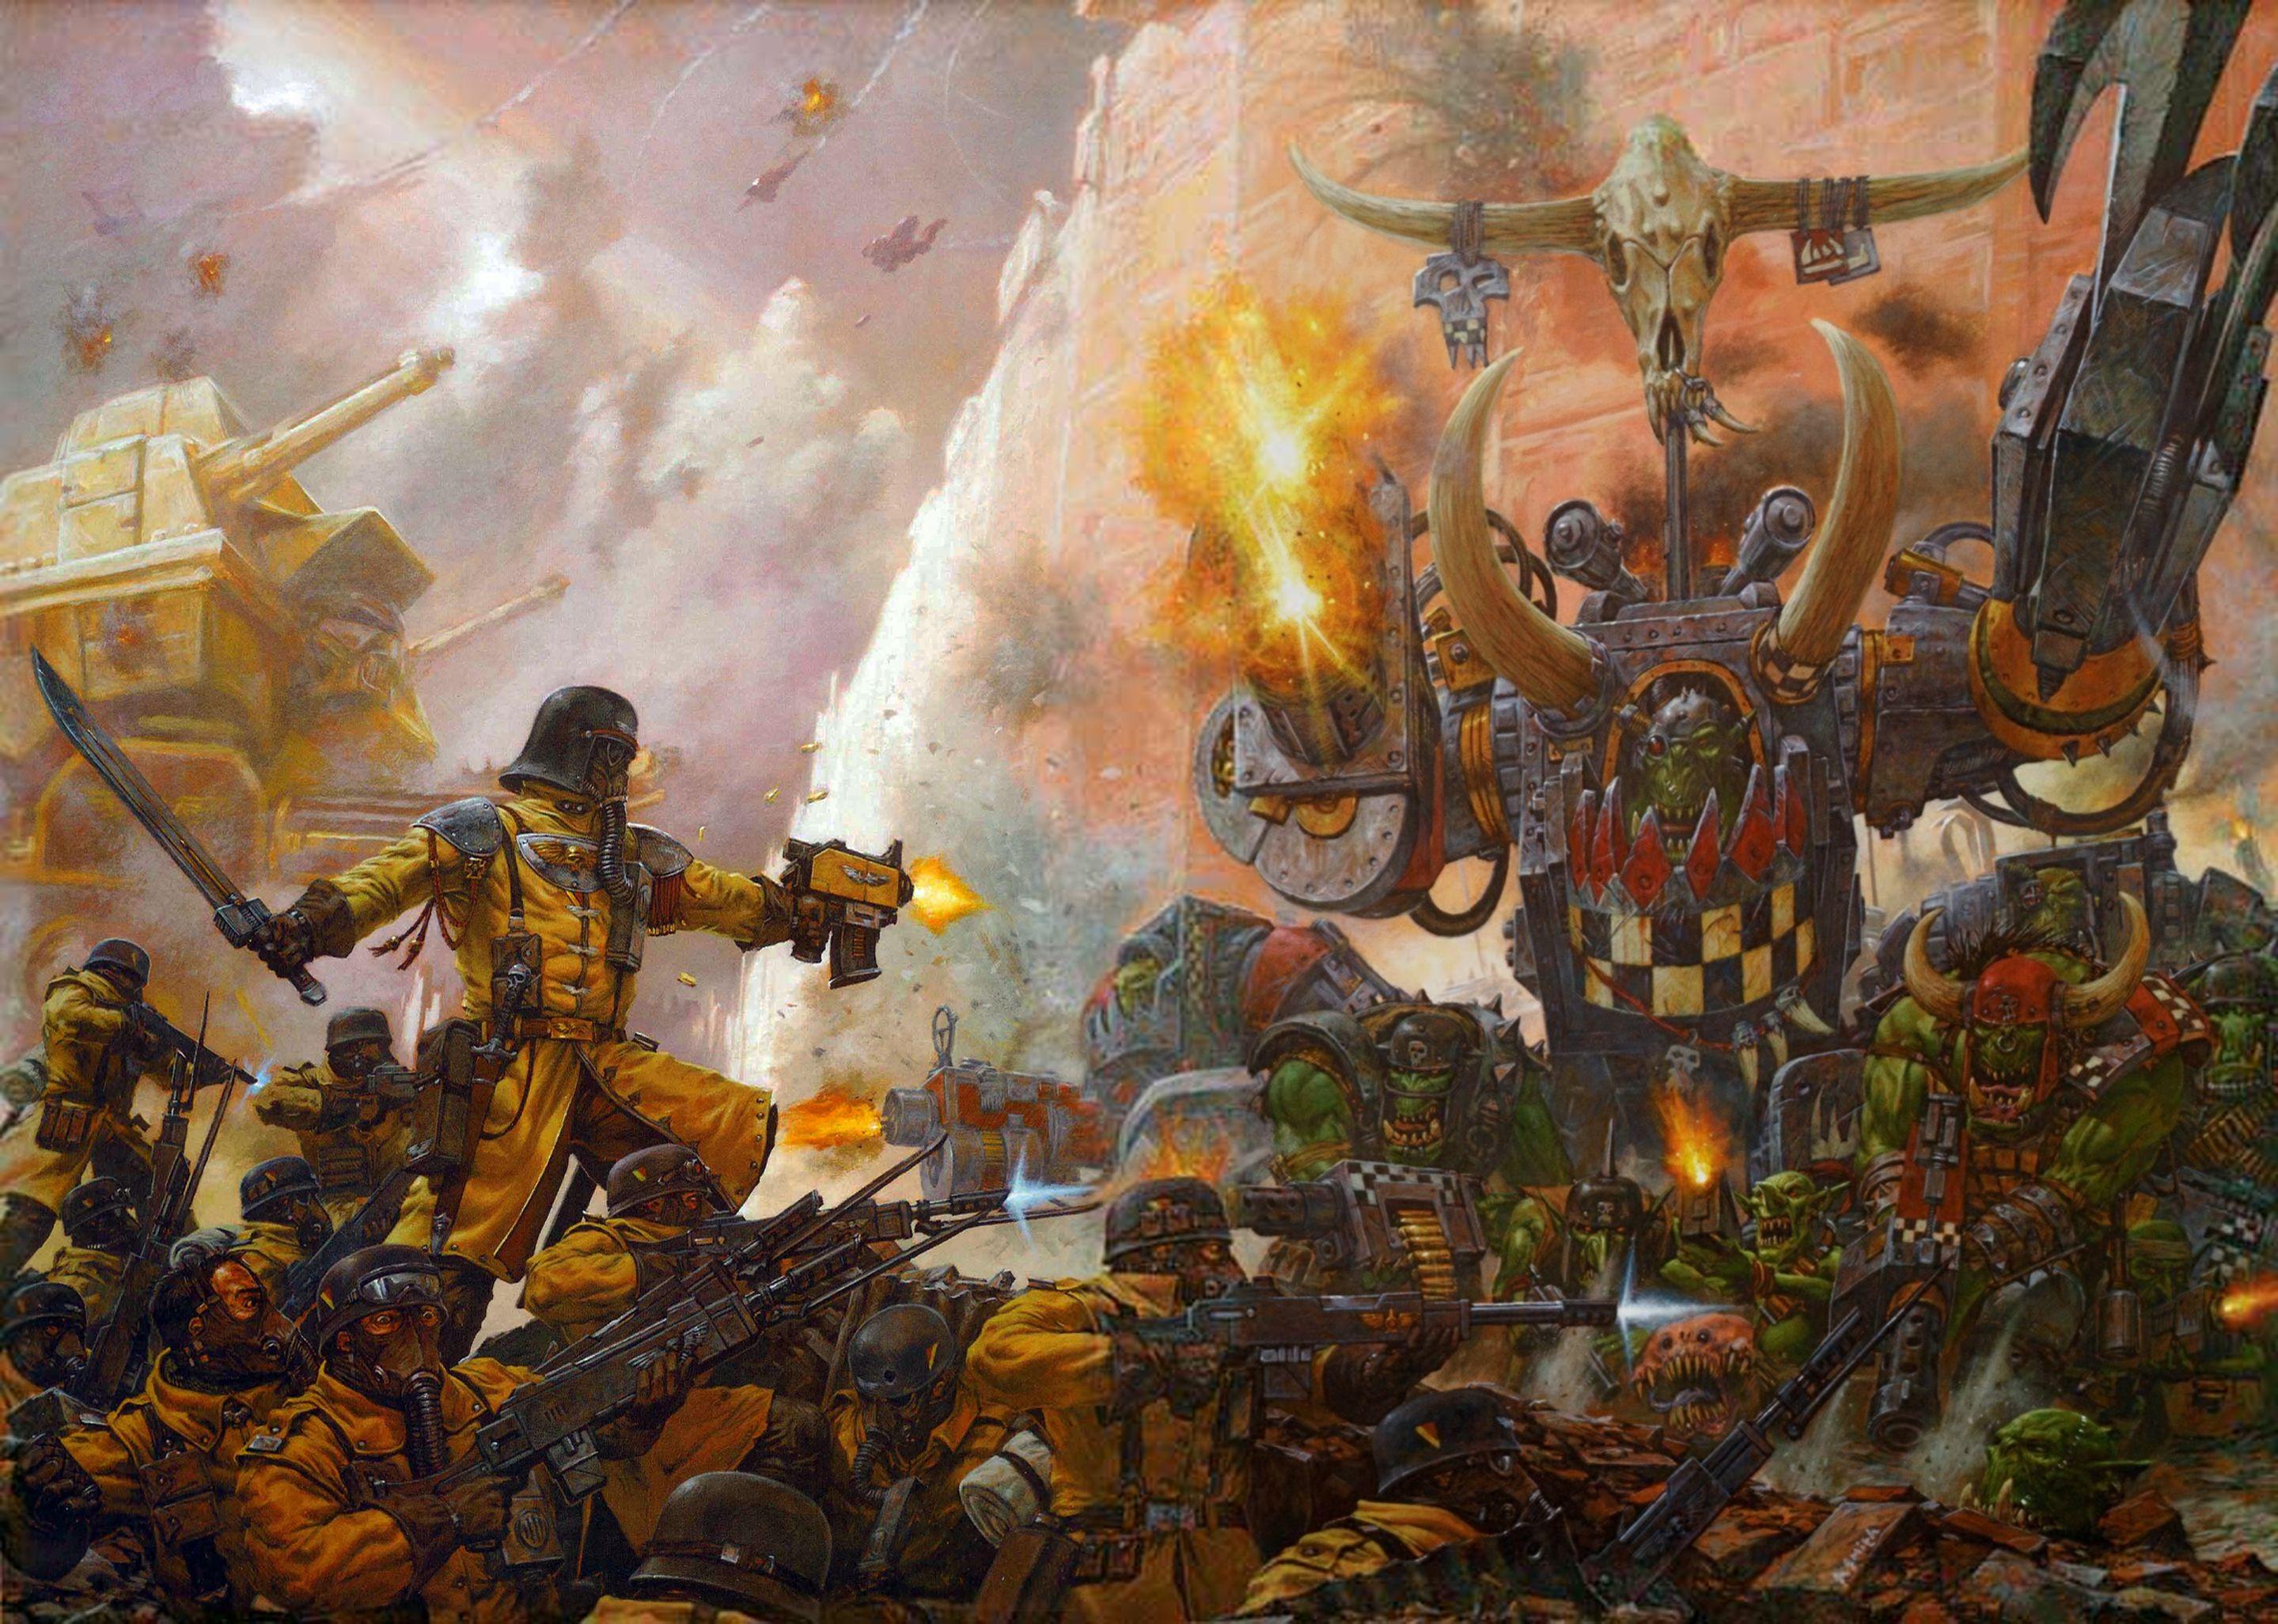 Armageddon Steel Legion Warboss Thraka   Warhammer 40k ... - photo#13